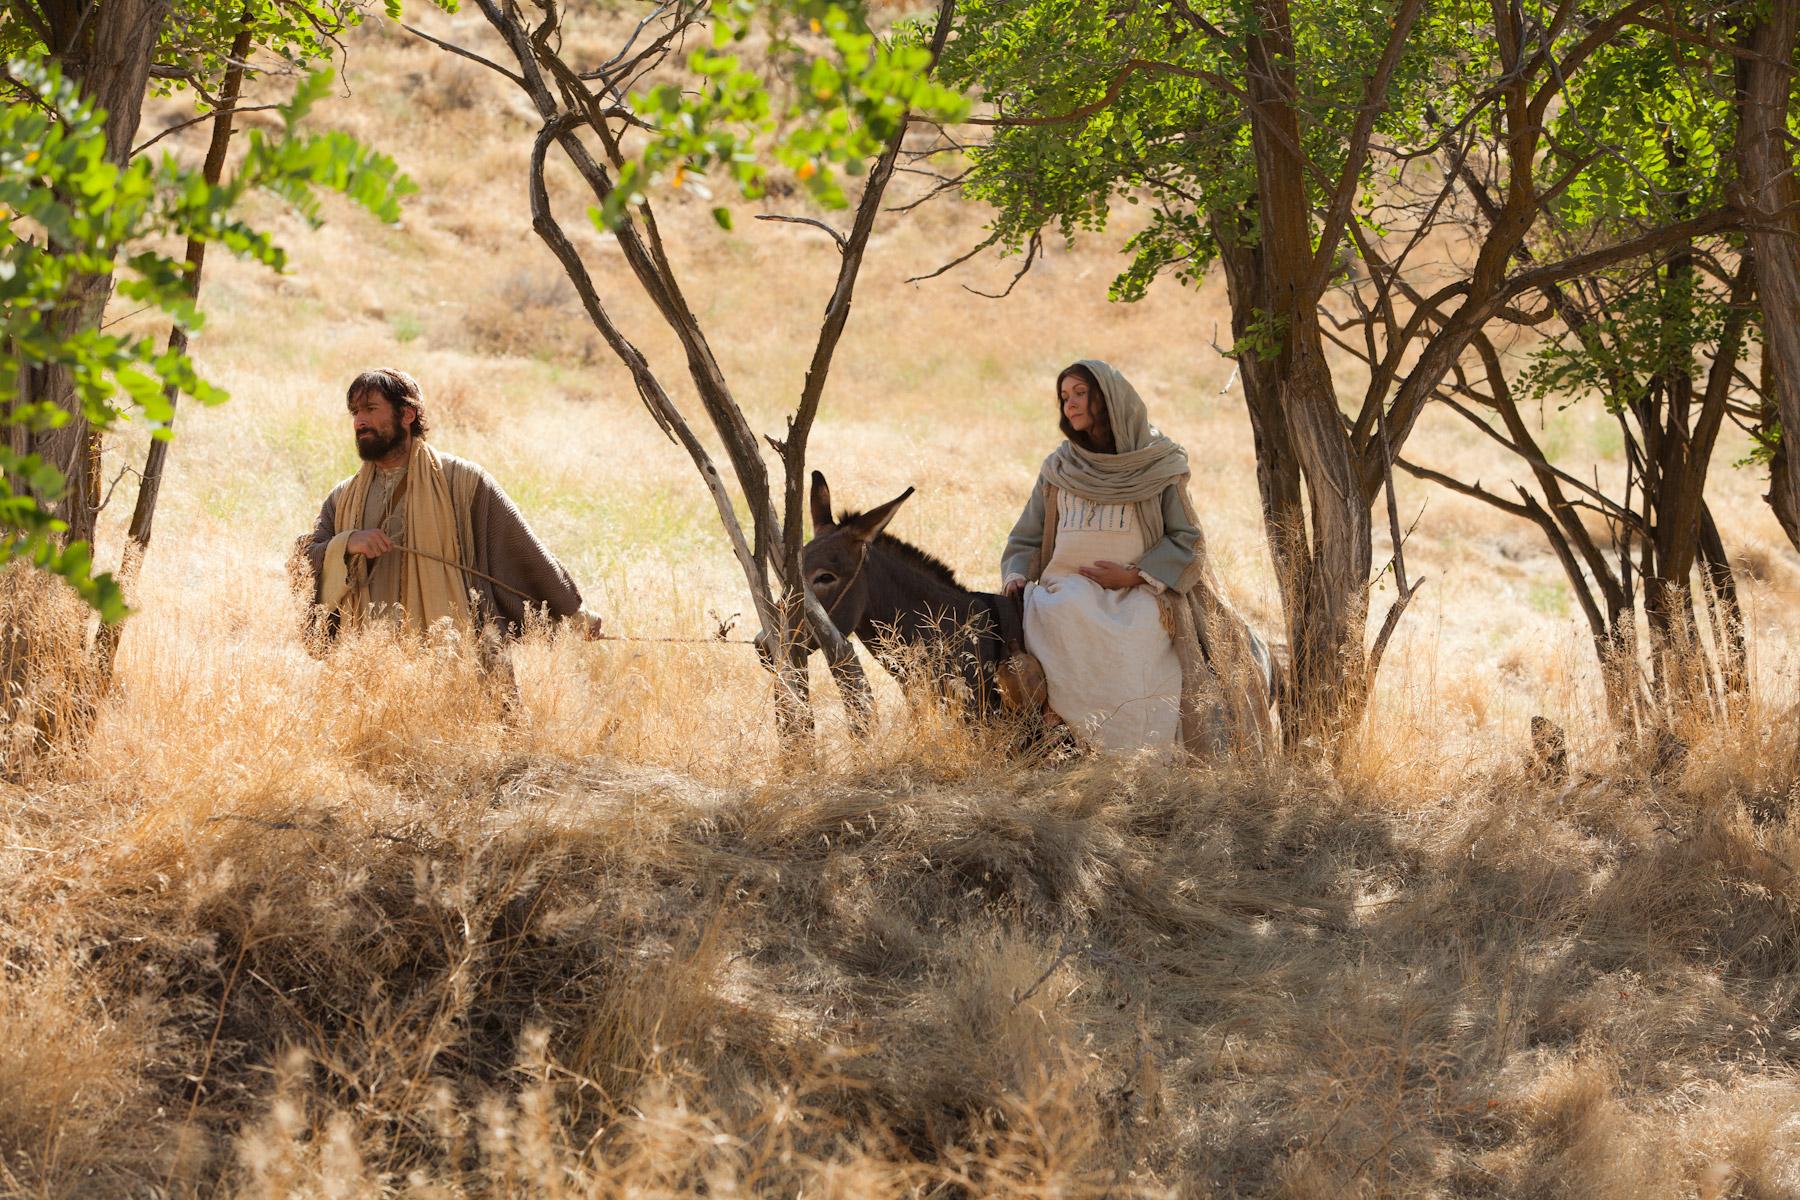 mary-travels-with-joseph-to-bethlehem